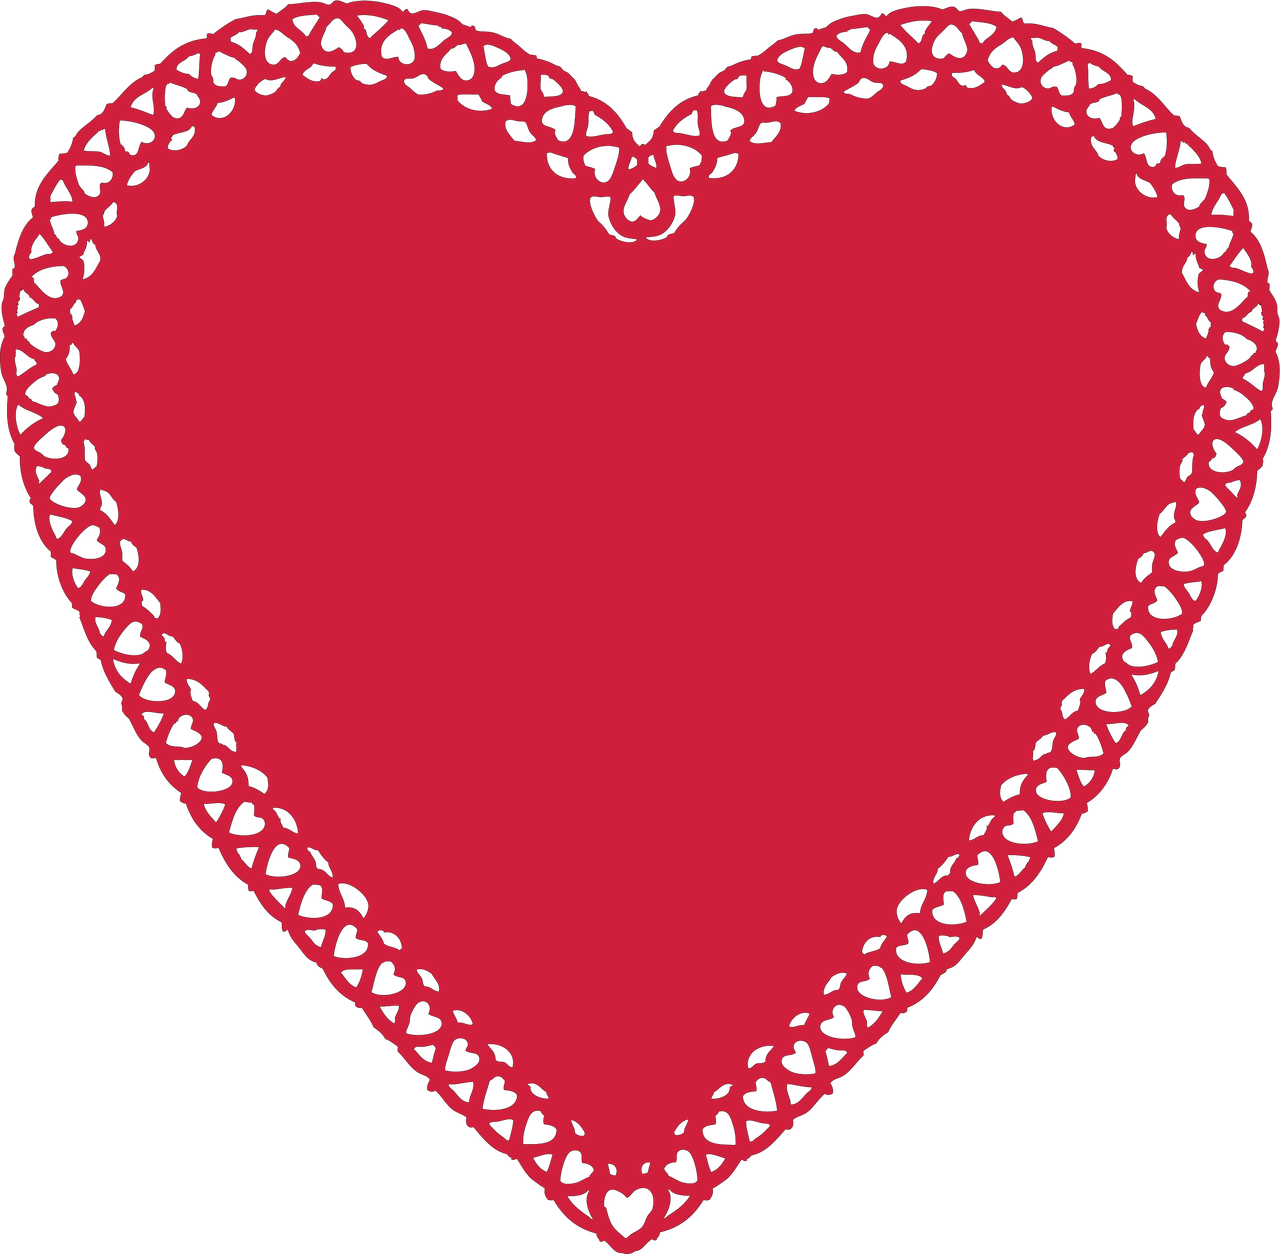 Heart Doily #2 SVG Cut File